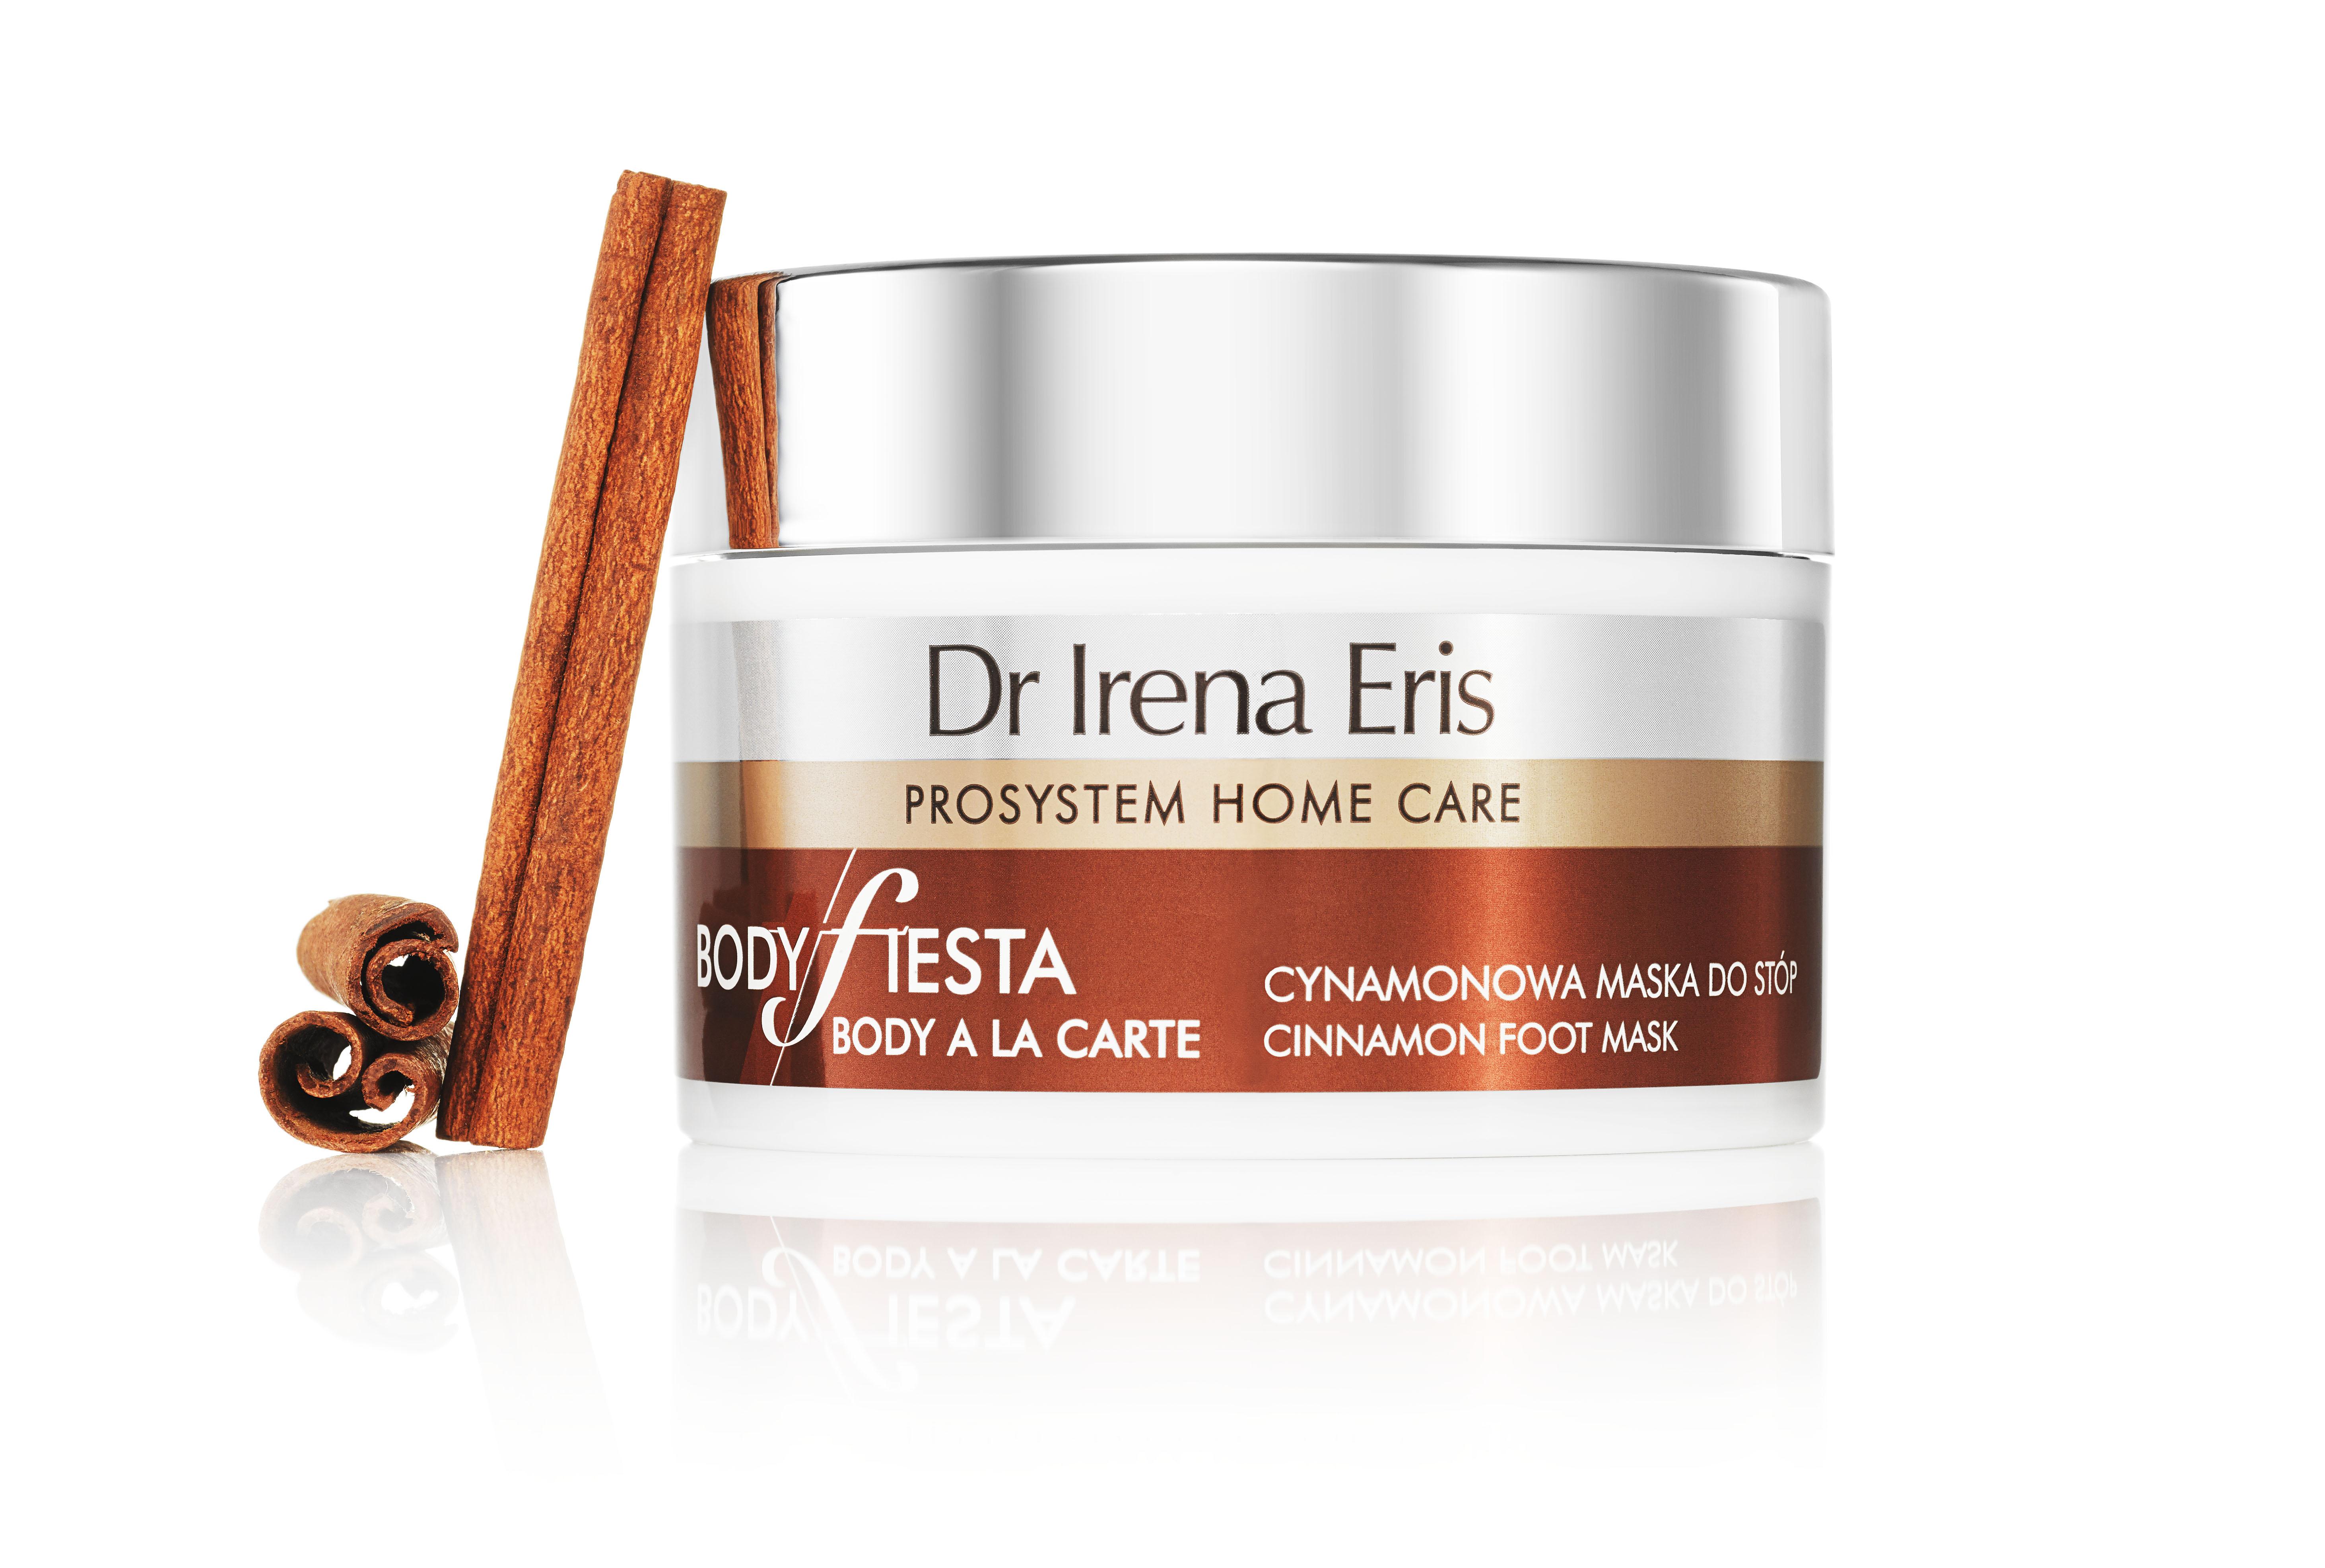 Dr Irena Eris Fiesta Maska cynamonowa